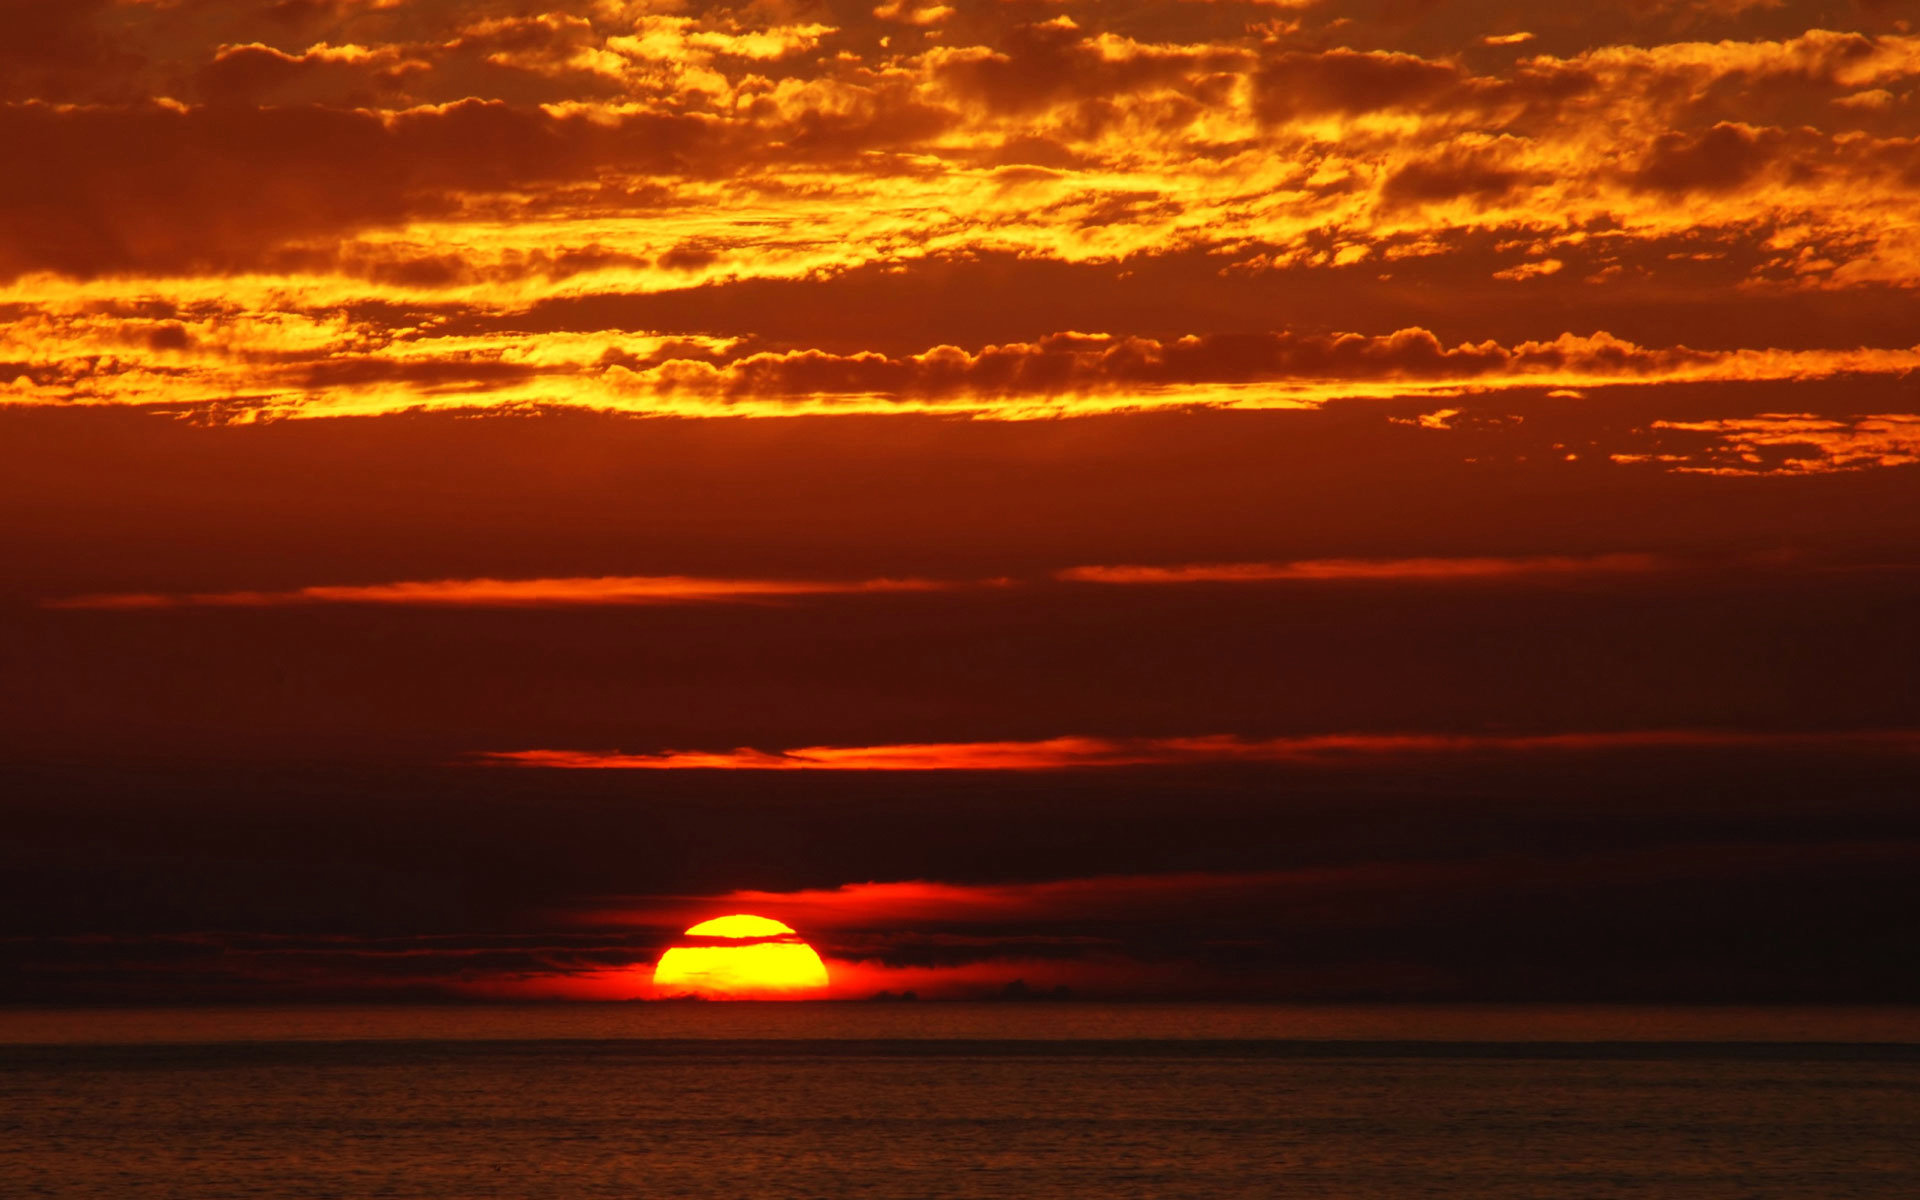 Sunset Backgrounds wallpaper - 104609